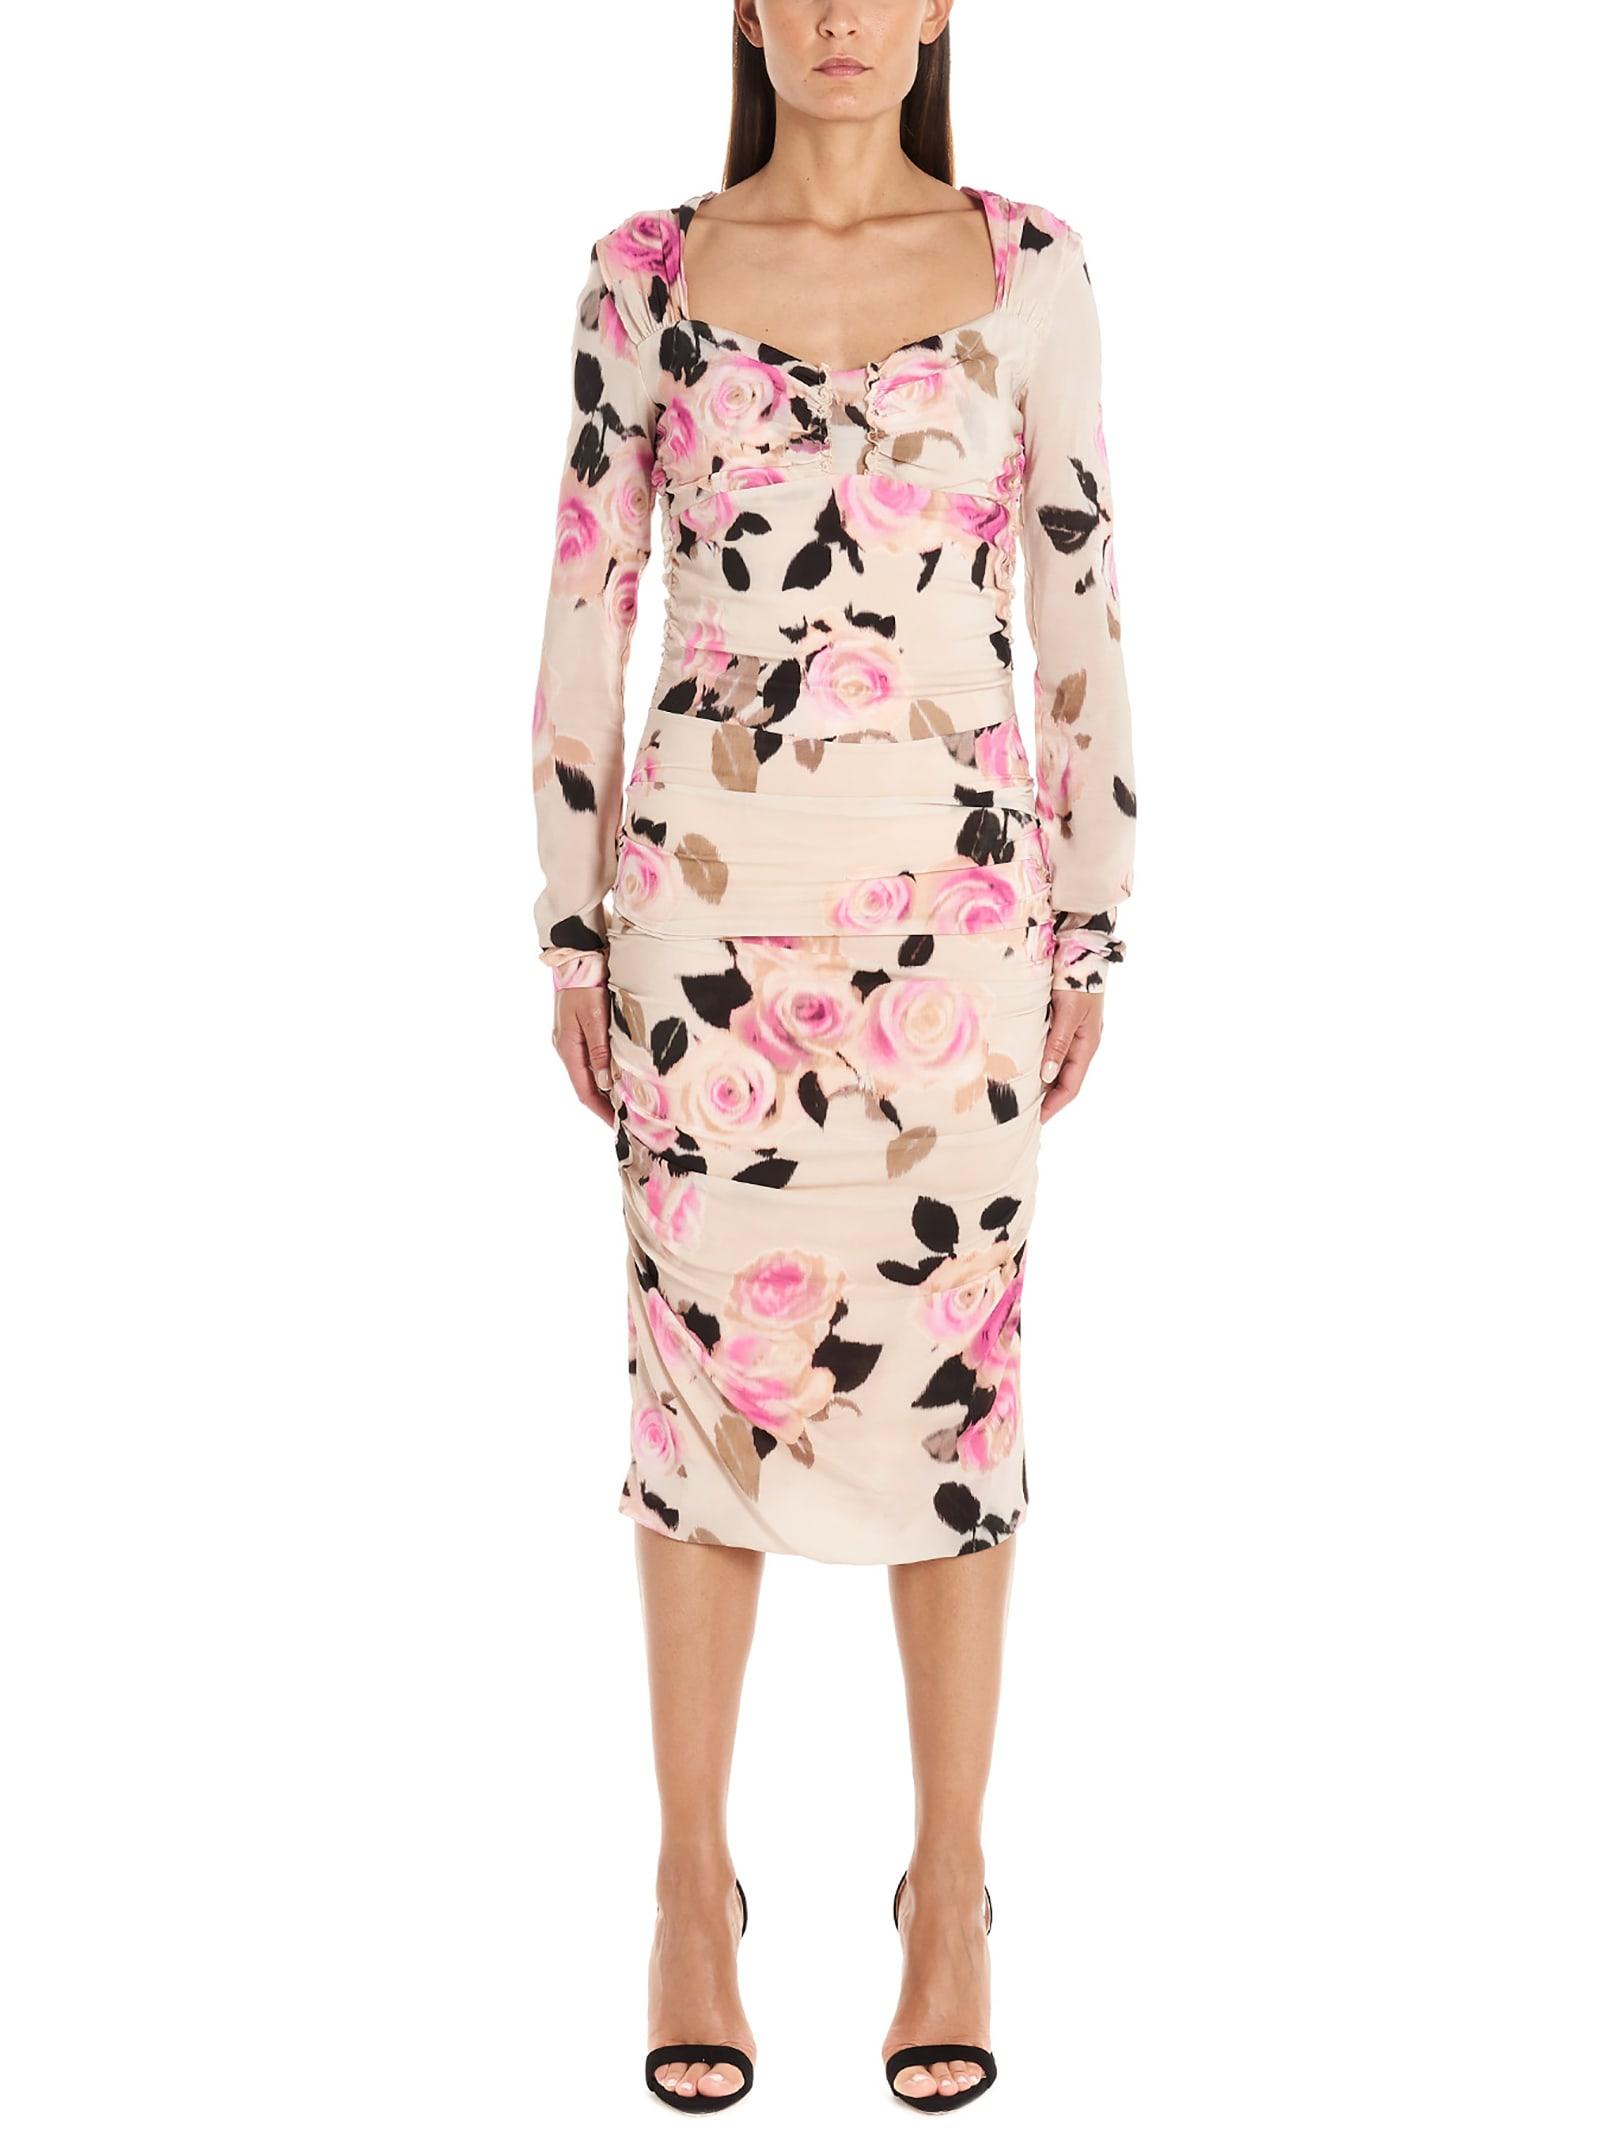 Pinko traballare Dress